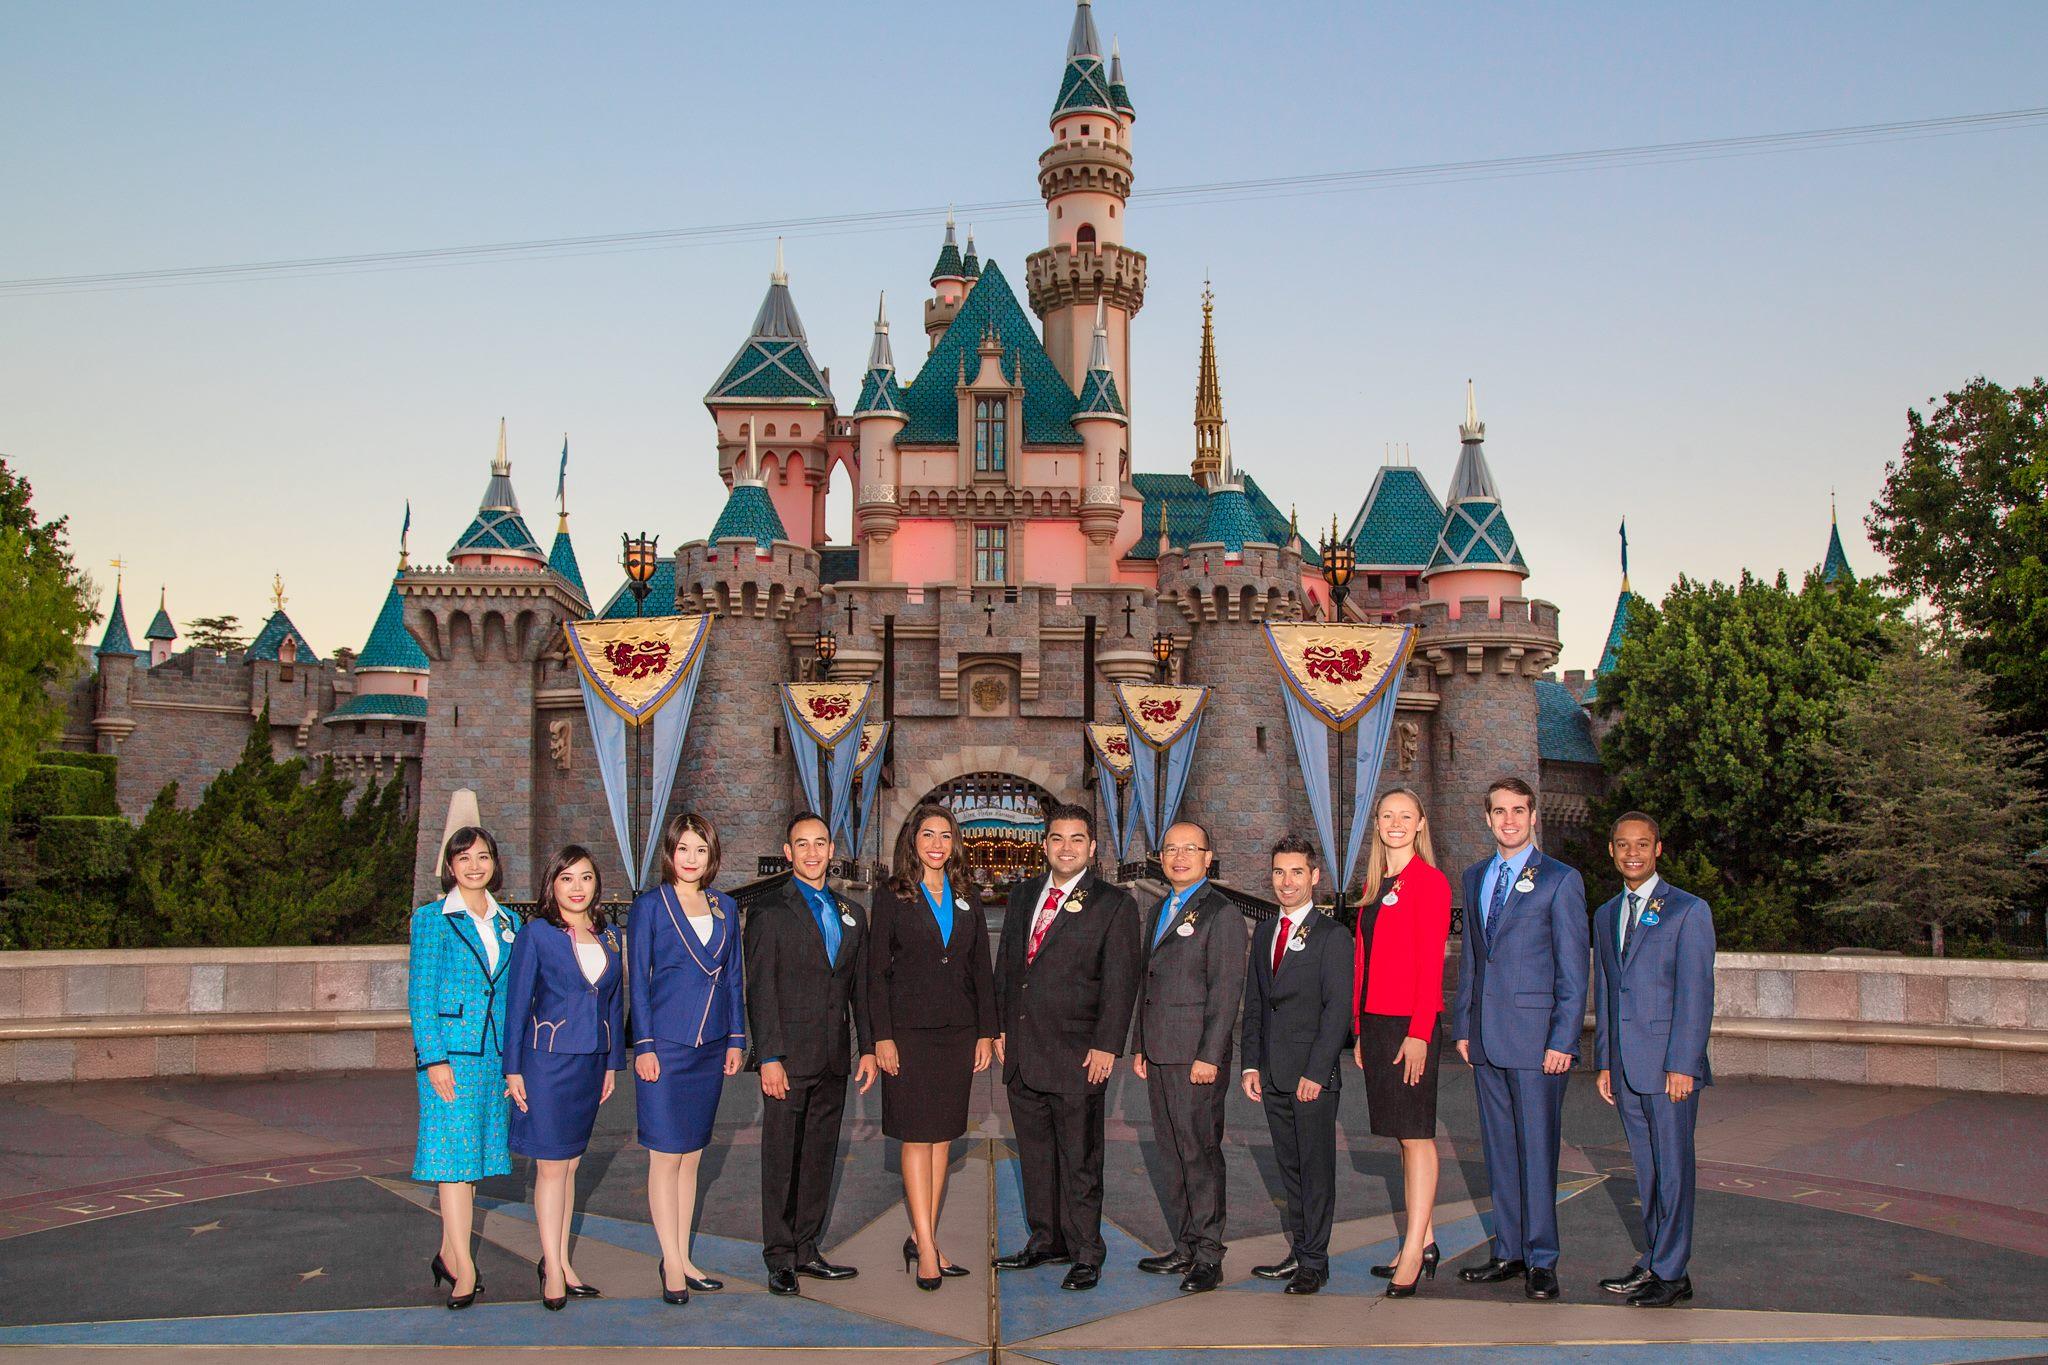 Les ambassadeurs des resorts Disney